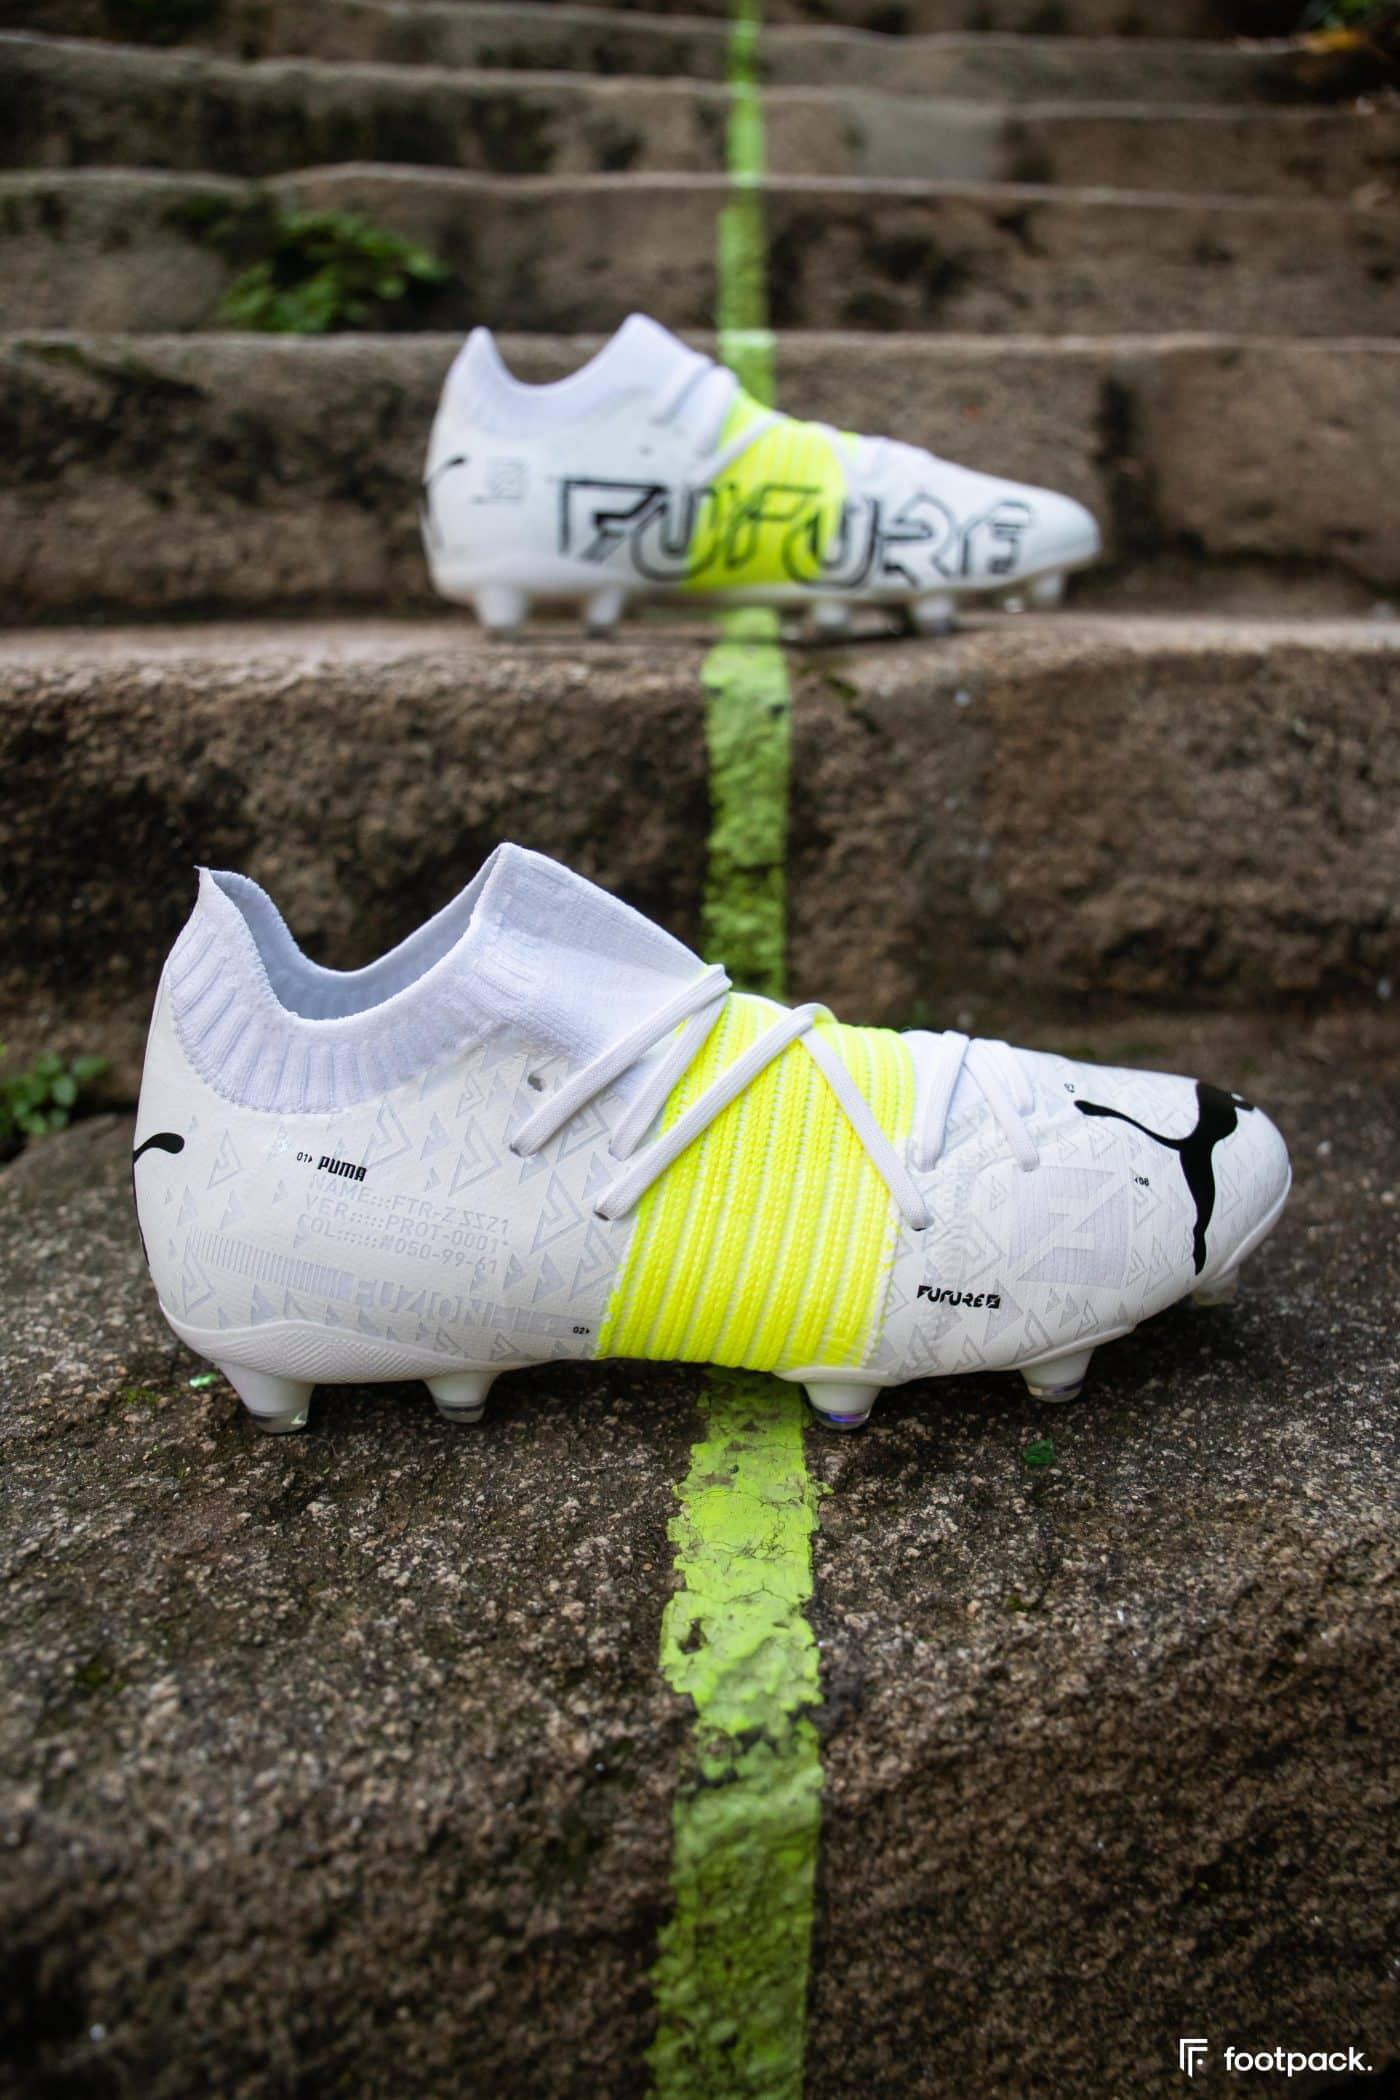 puma-future-z-teaser-edition-shooting-footpack-37